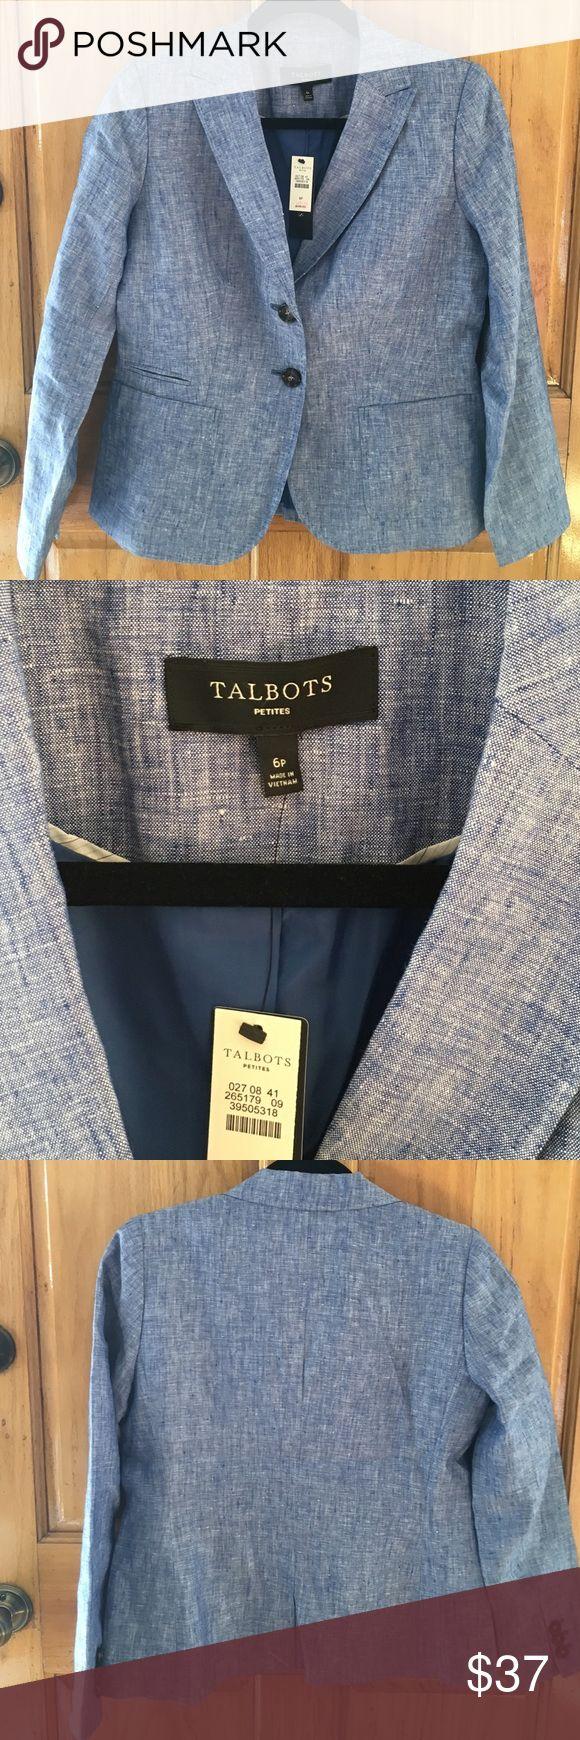 Talbots chambray linen blazer Linen chambray blazer, BNWT, pinstripe lining on sleeves (see pic) bought last season, run large Talbots Jackets & Coats Blazers